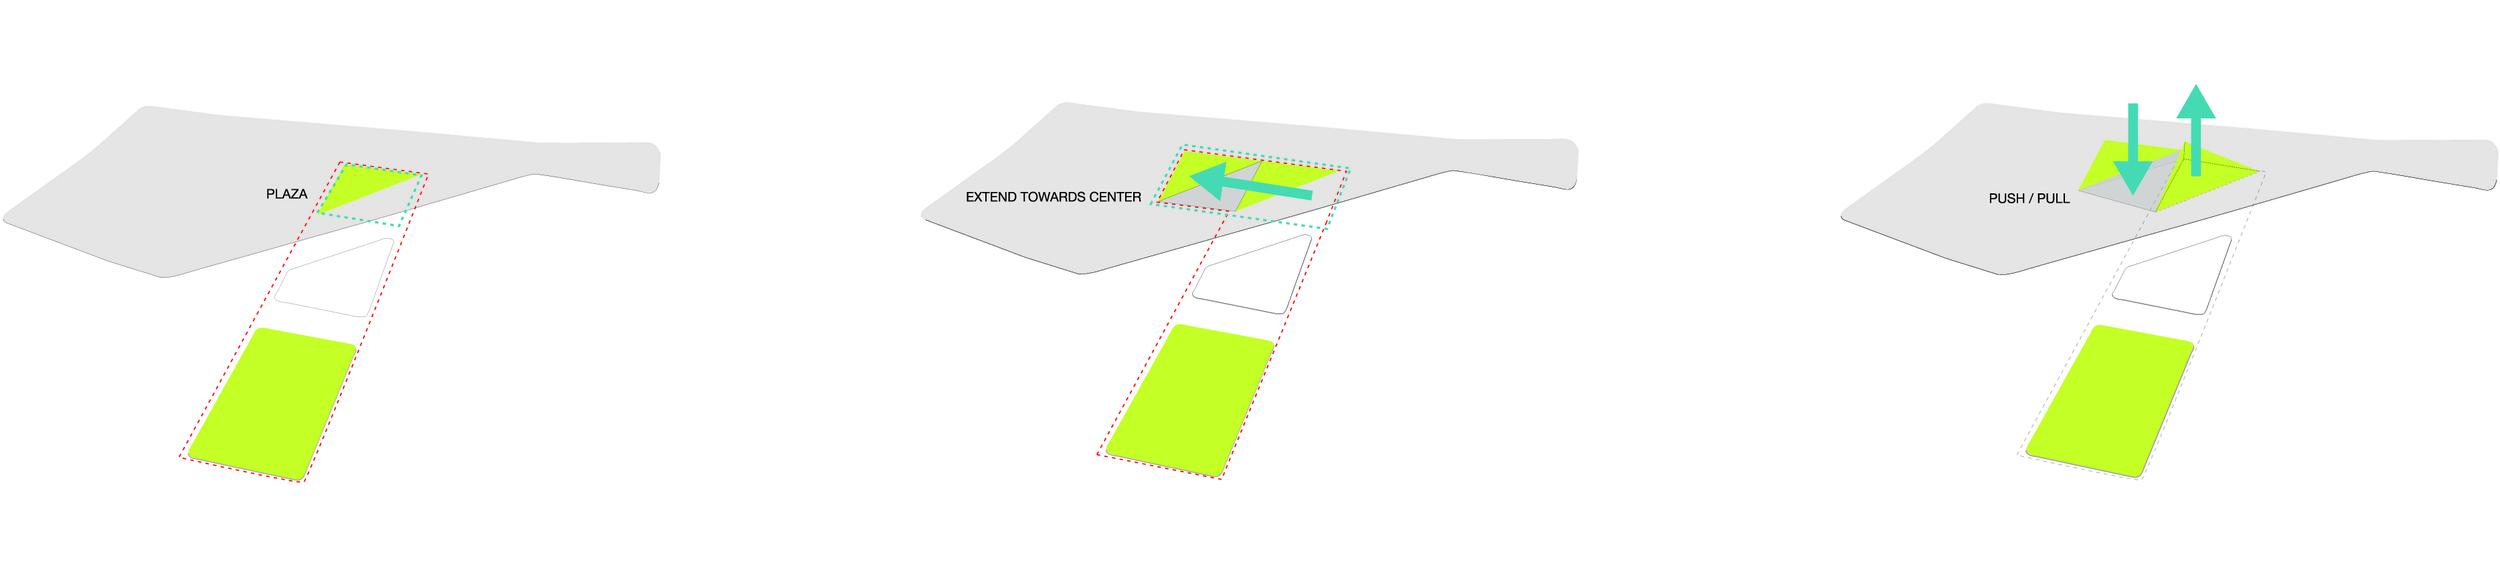 diagram 2-01.jpg